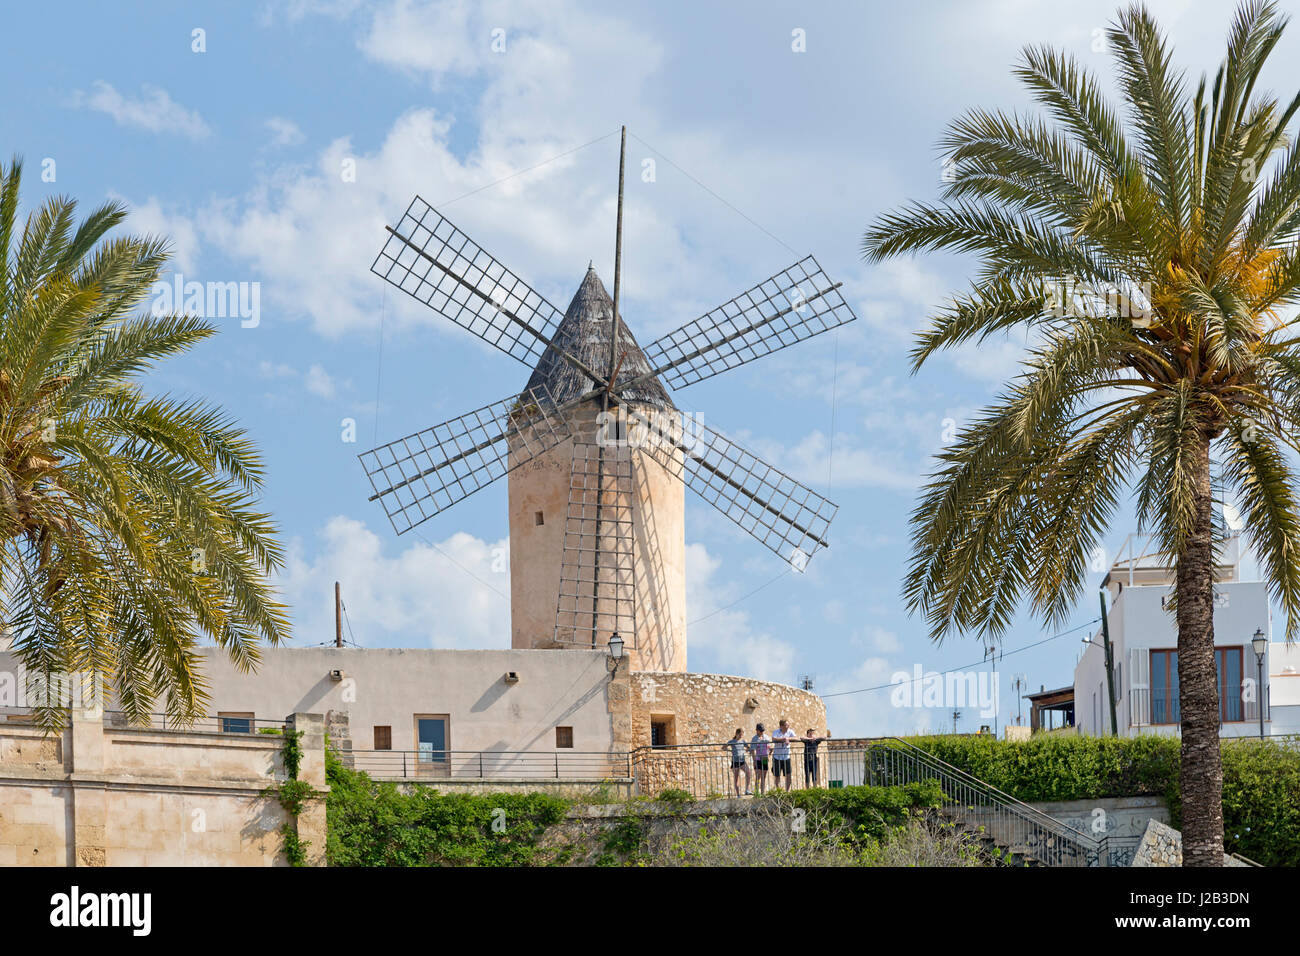 windmill at Paseo Maritimo in Palma de Mallorca, Spain - Stock Image